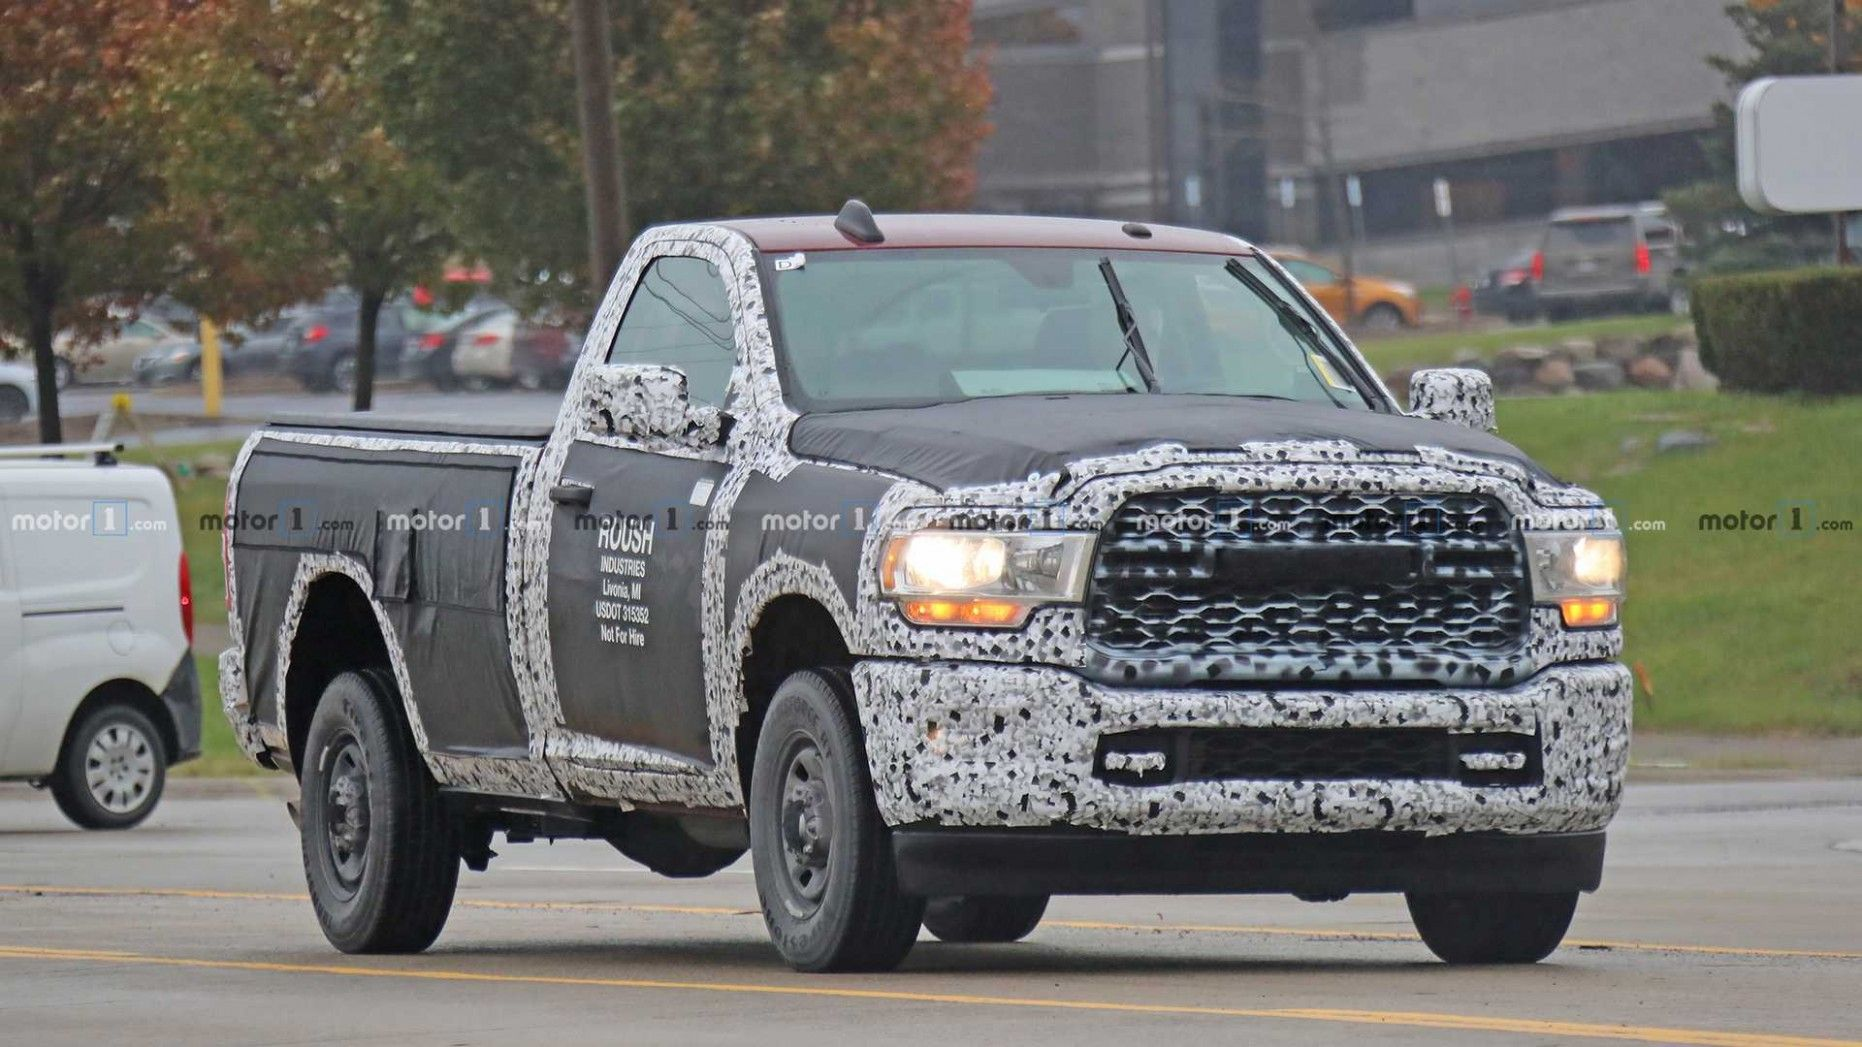 2020 Dodge Truck Lineup Pricing 2020 Dodge Truck Lineup Arlington Texas Sept 20 2019 Prnewswire Prweb At Classic Chrysler Power Wagon Ram Power Wagon